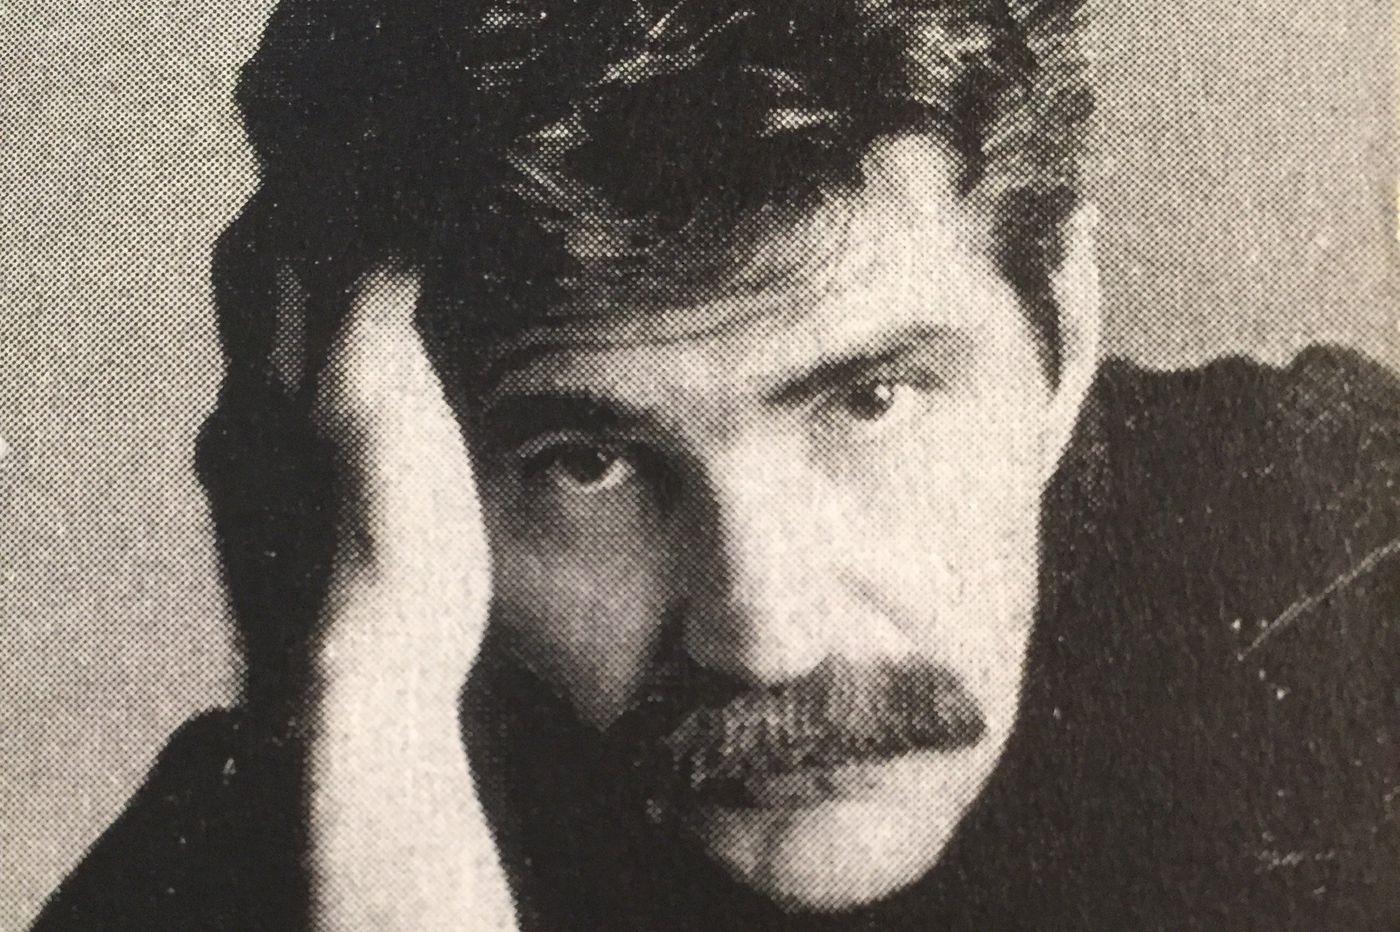 Joe Baltake, former film critic for Philadelphia Daily News, Sacramento Bee, dies at 74